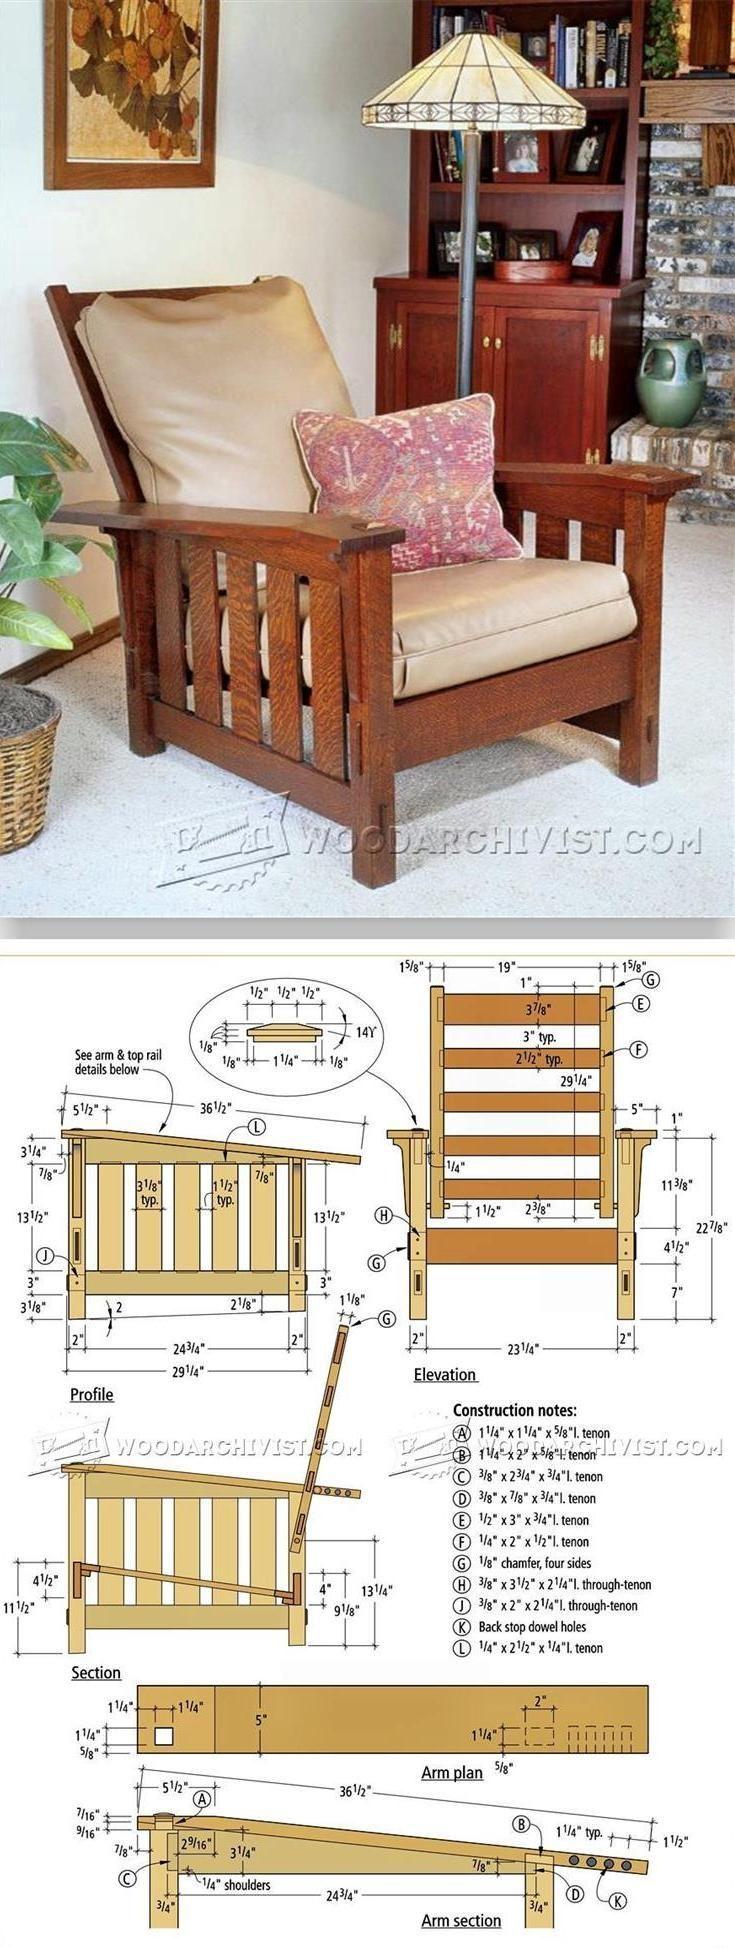 Morris chair plans outdoor - Morris Chair Plans Furniture Plans And Projects Woodarchivist Com